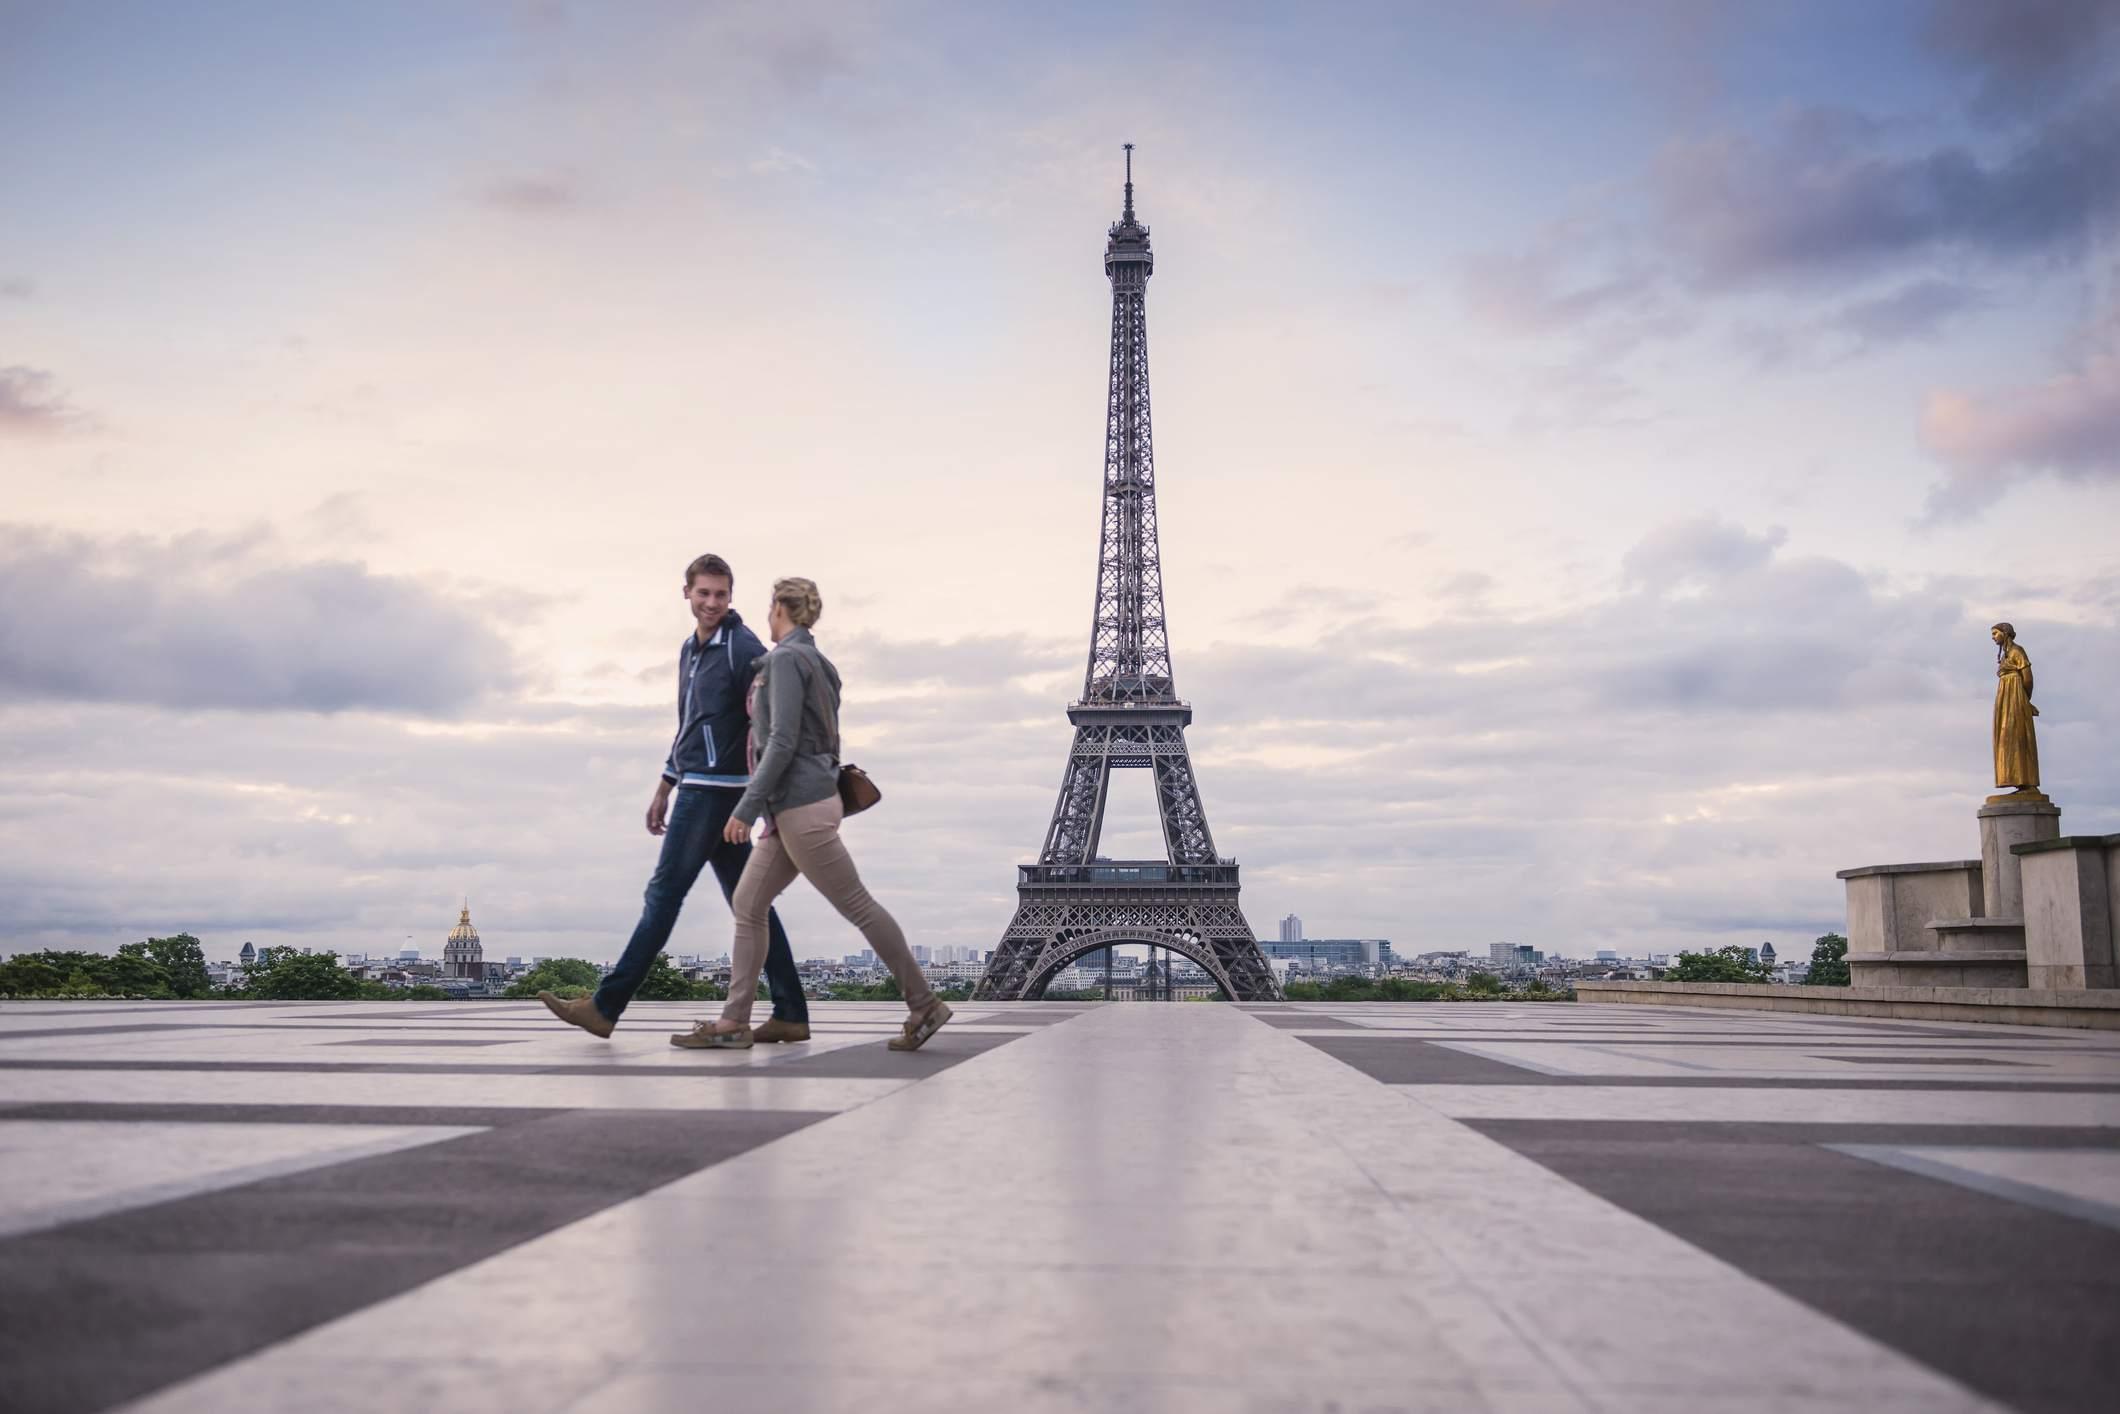 Caucasian couple walking near Eiffel Tower, Paris, France